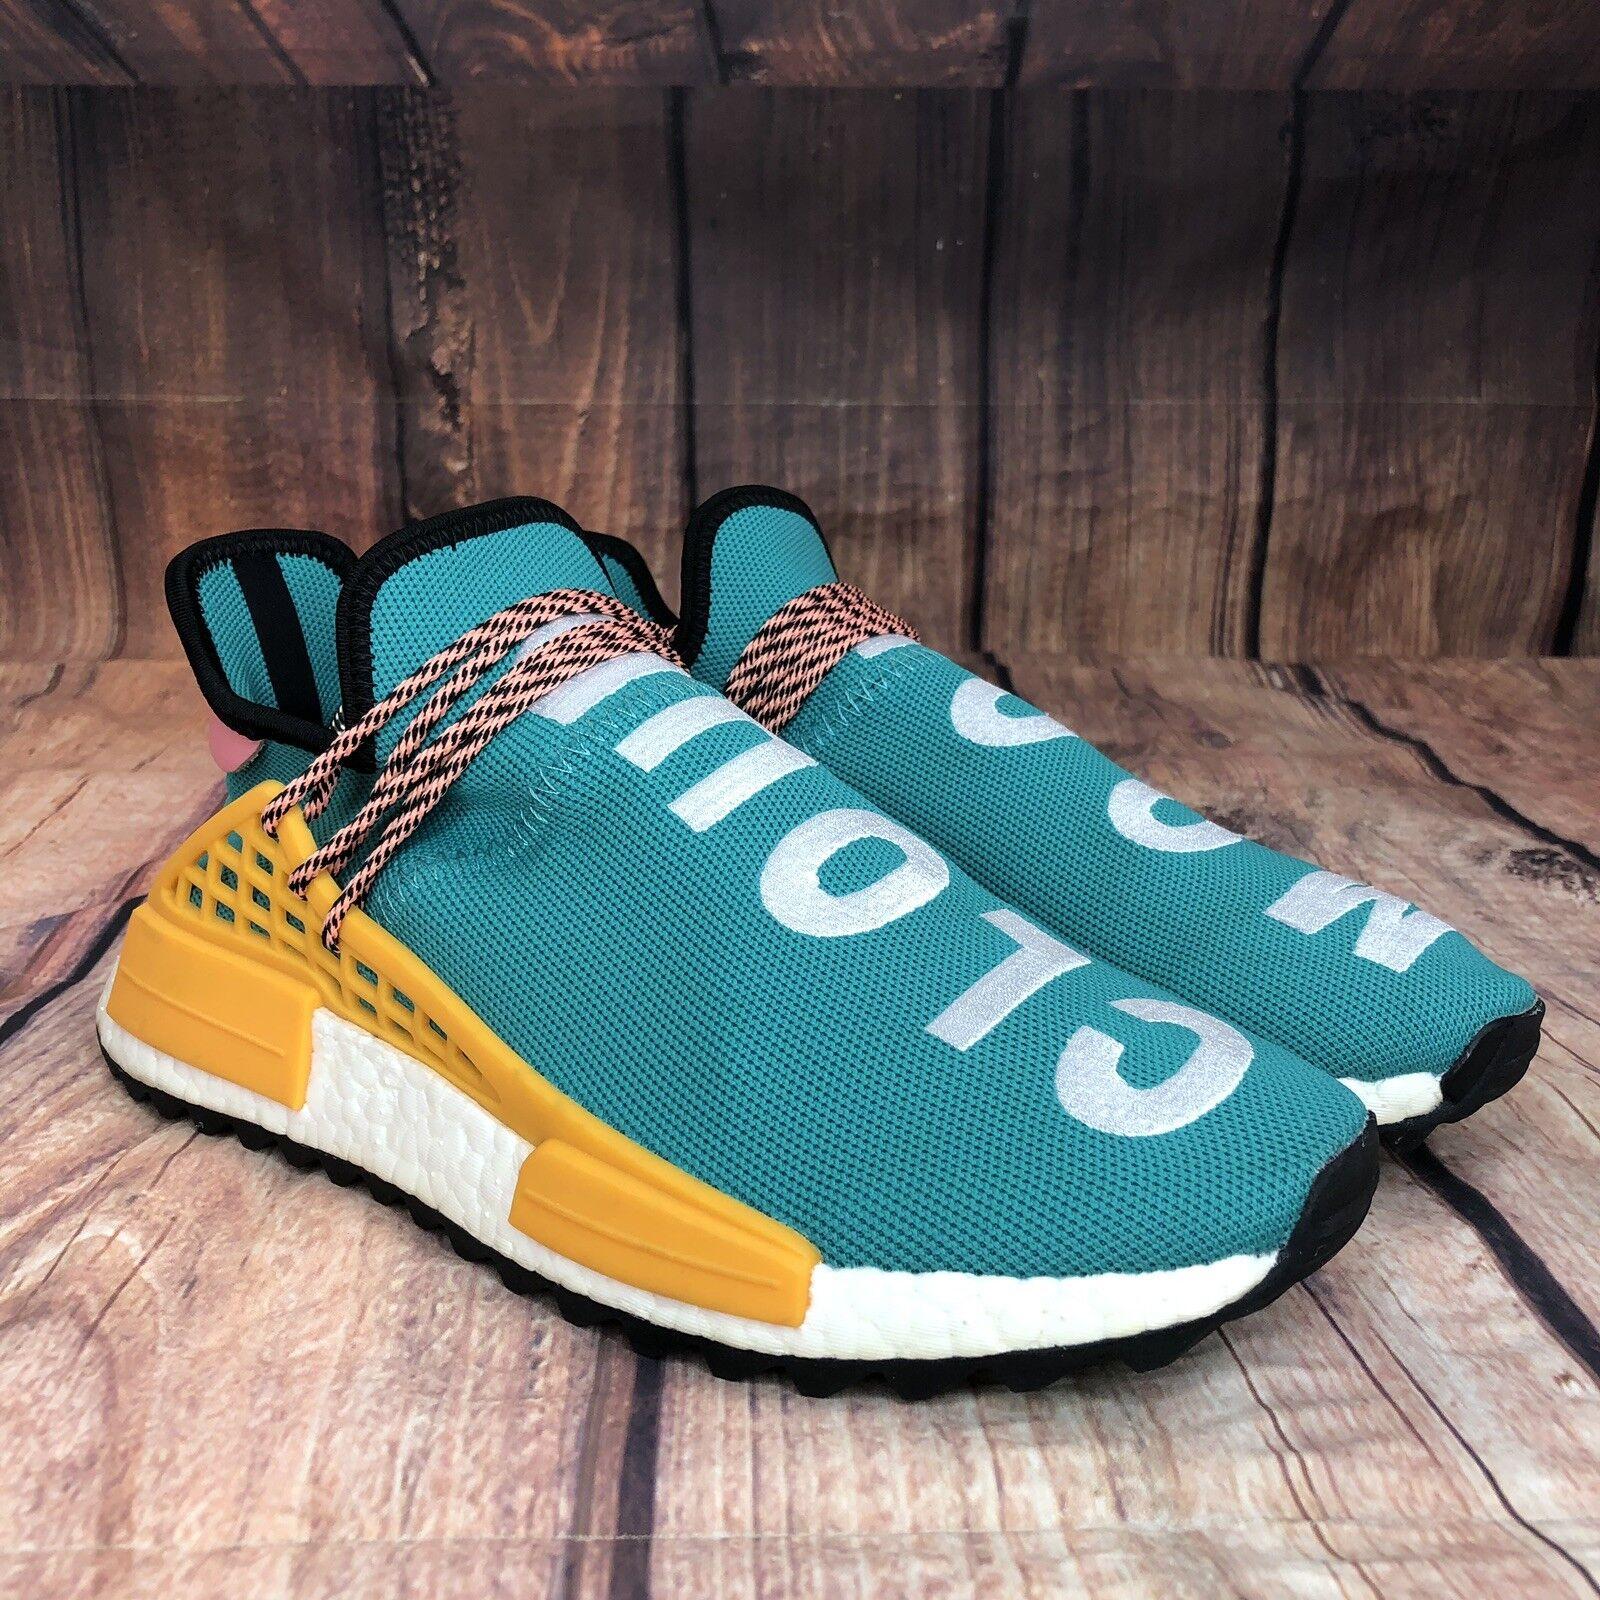 Adidas Human Race Pharell Williams Sun Glow NMD Men Size 10.5 Teal bluee AC7188